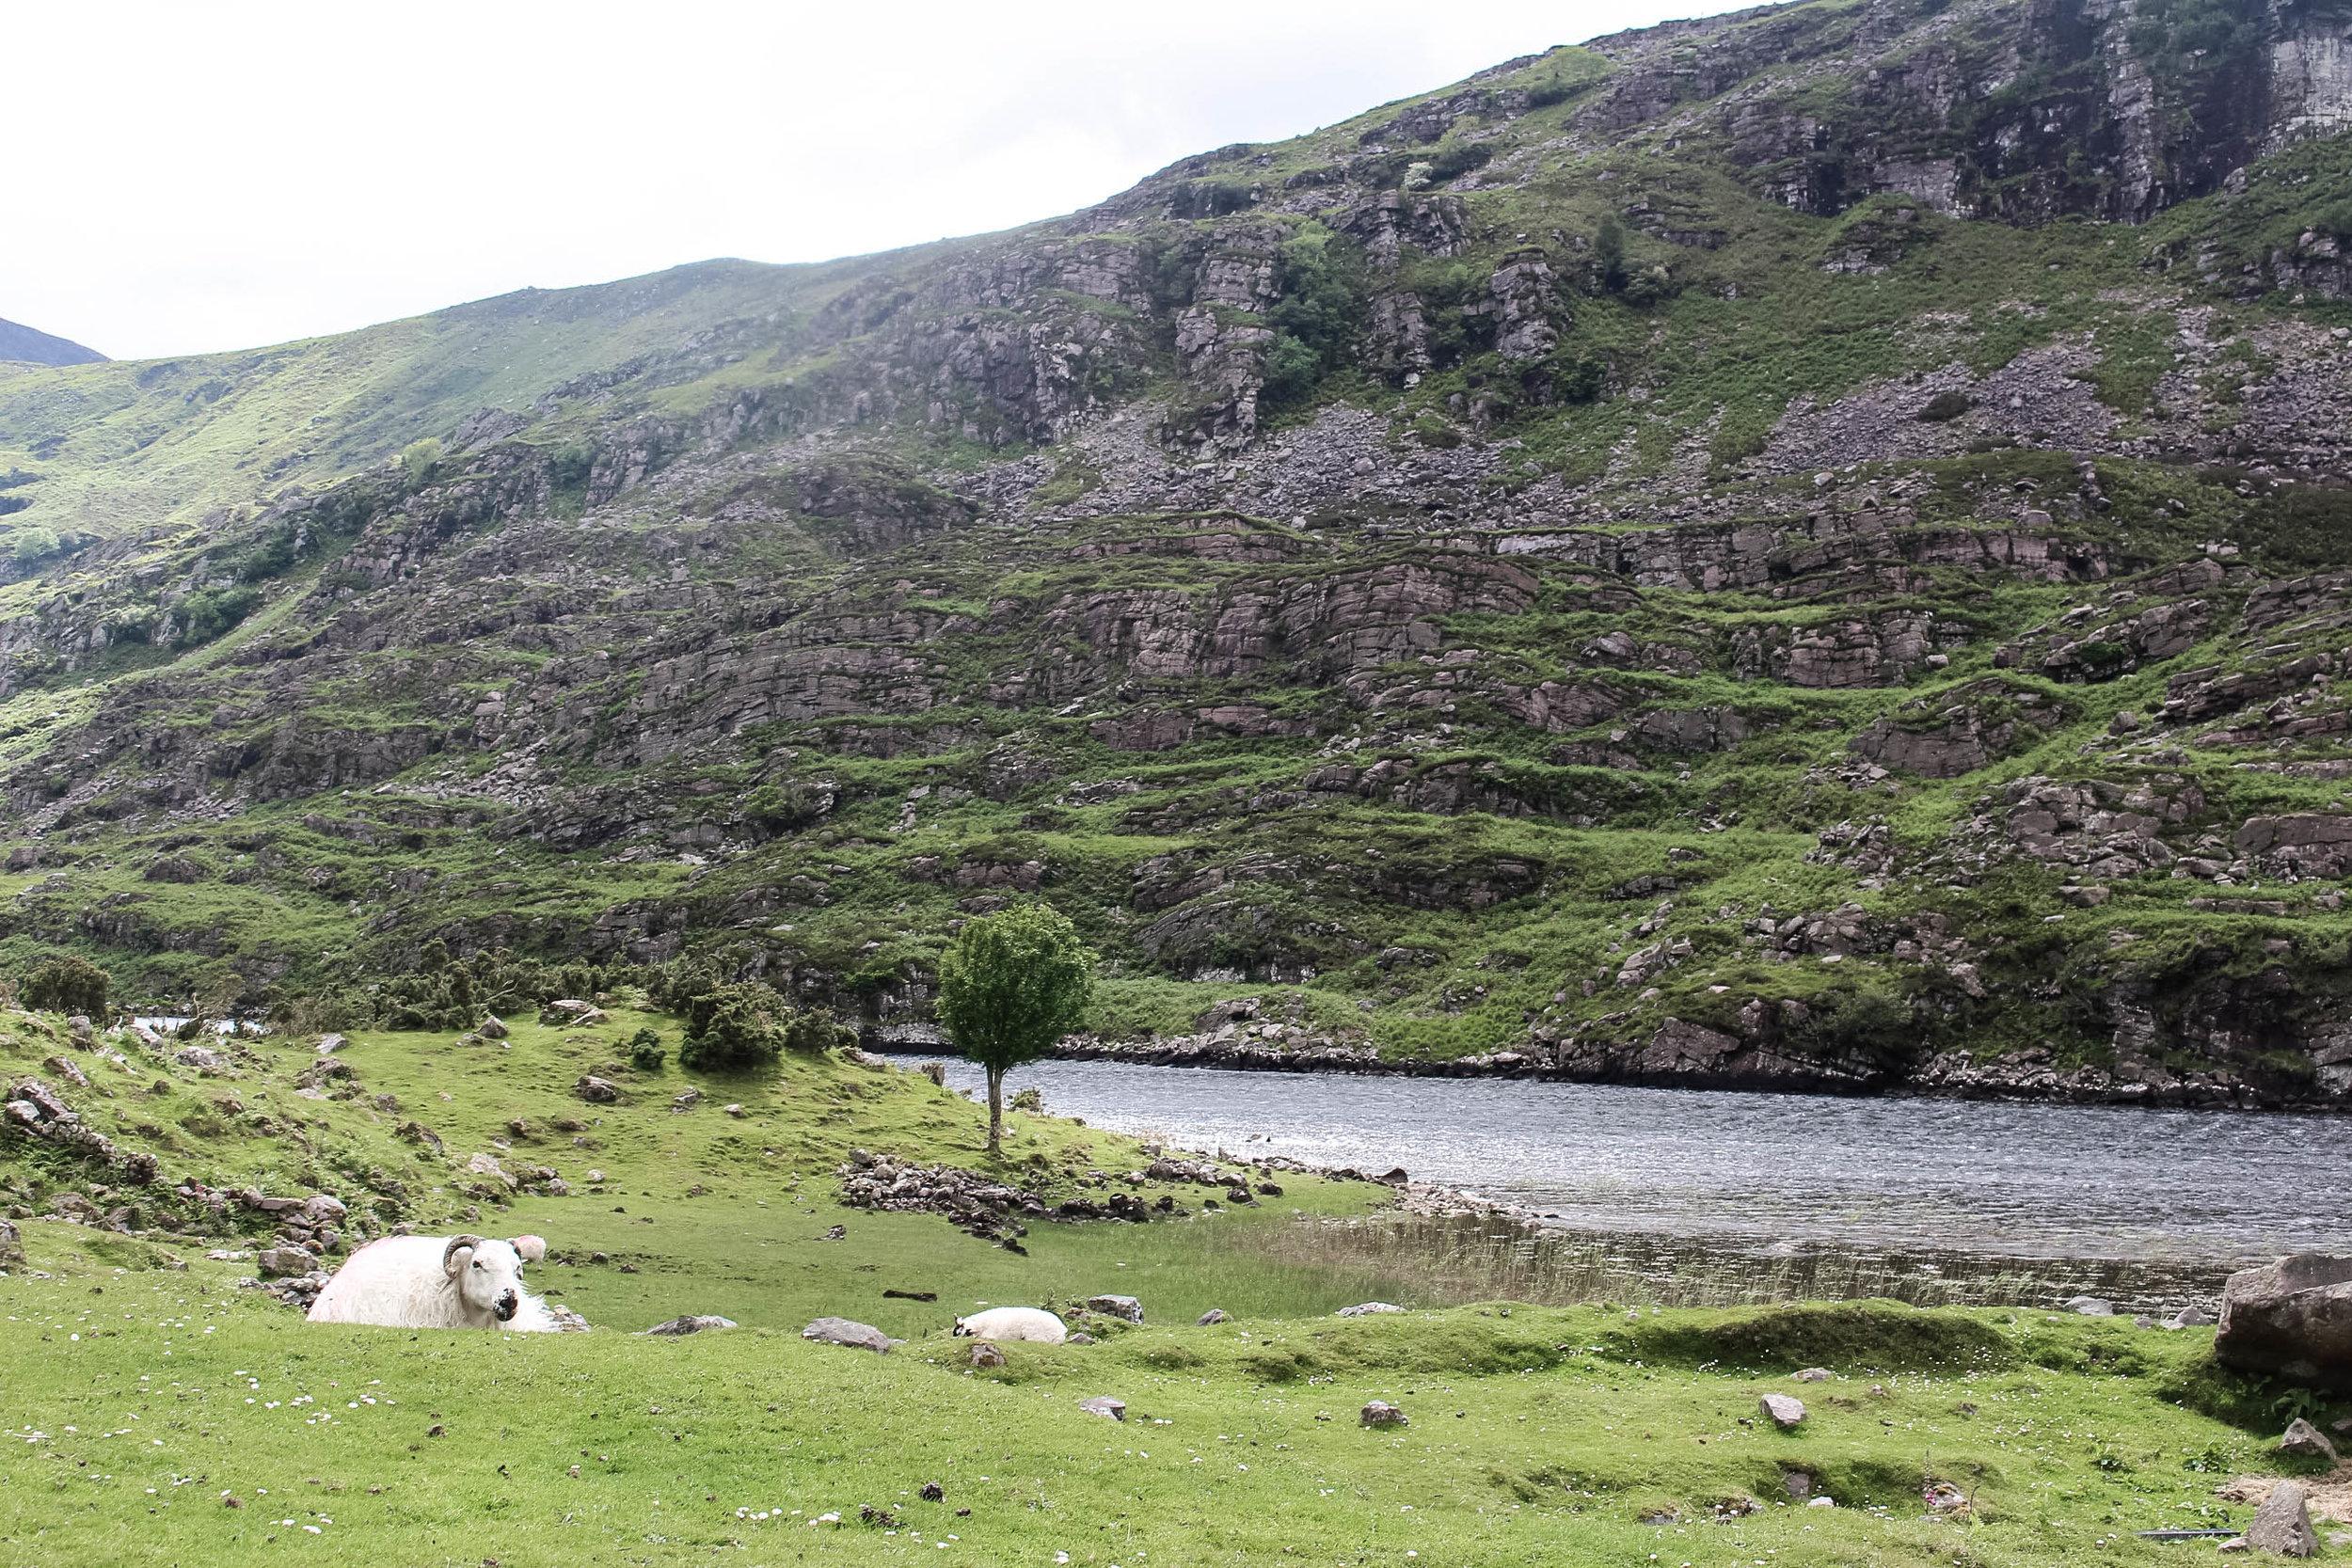 Gap of Dunloe - Killarney, Ireland - Things to do - True North Paper Co. Blog